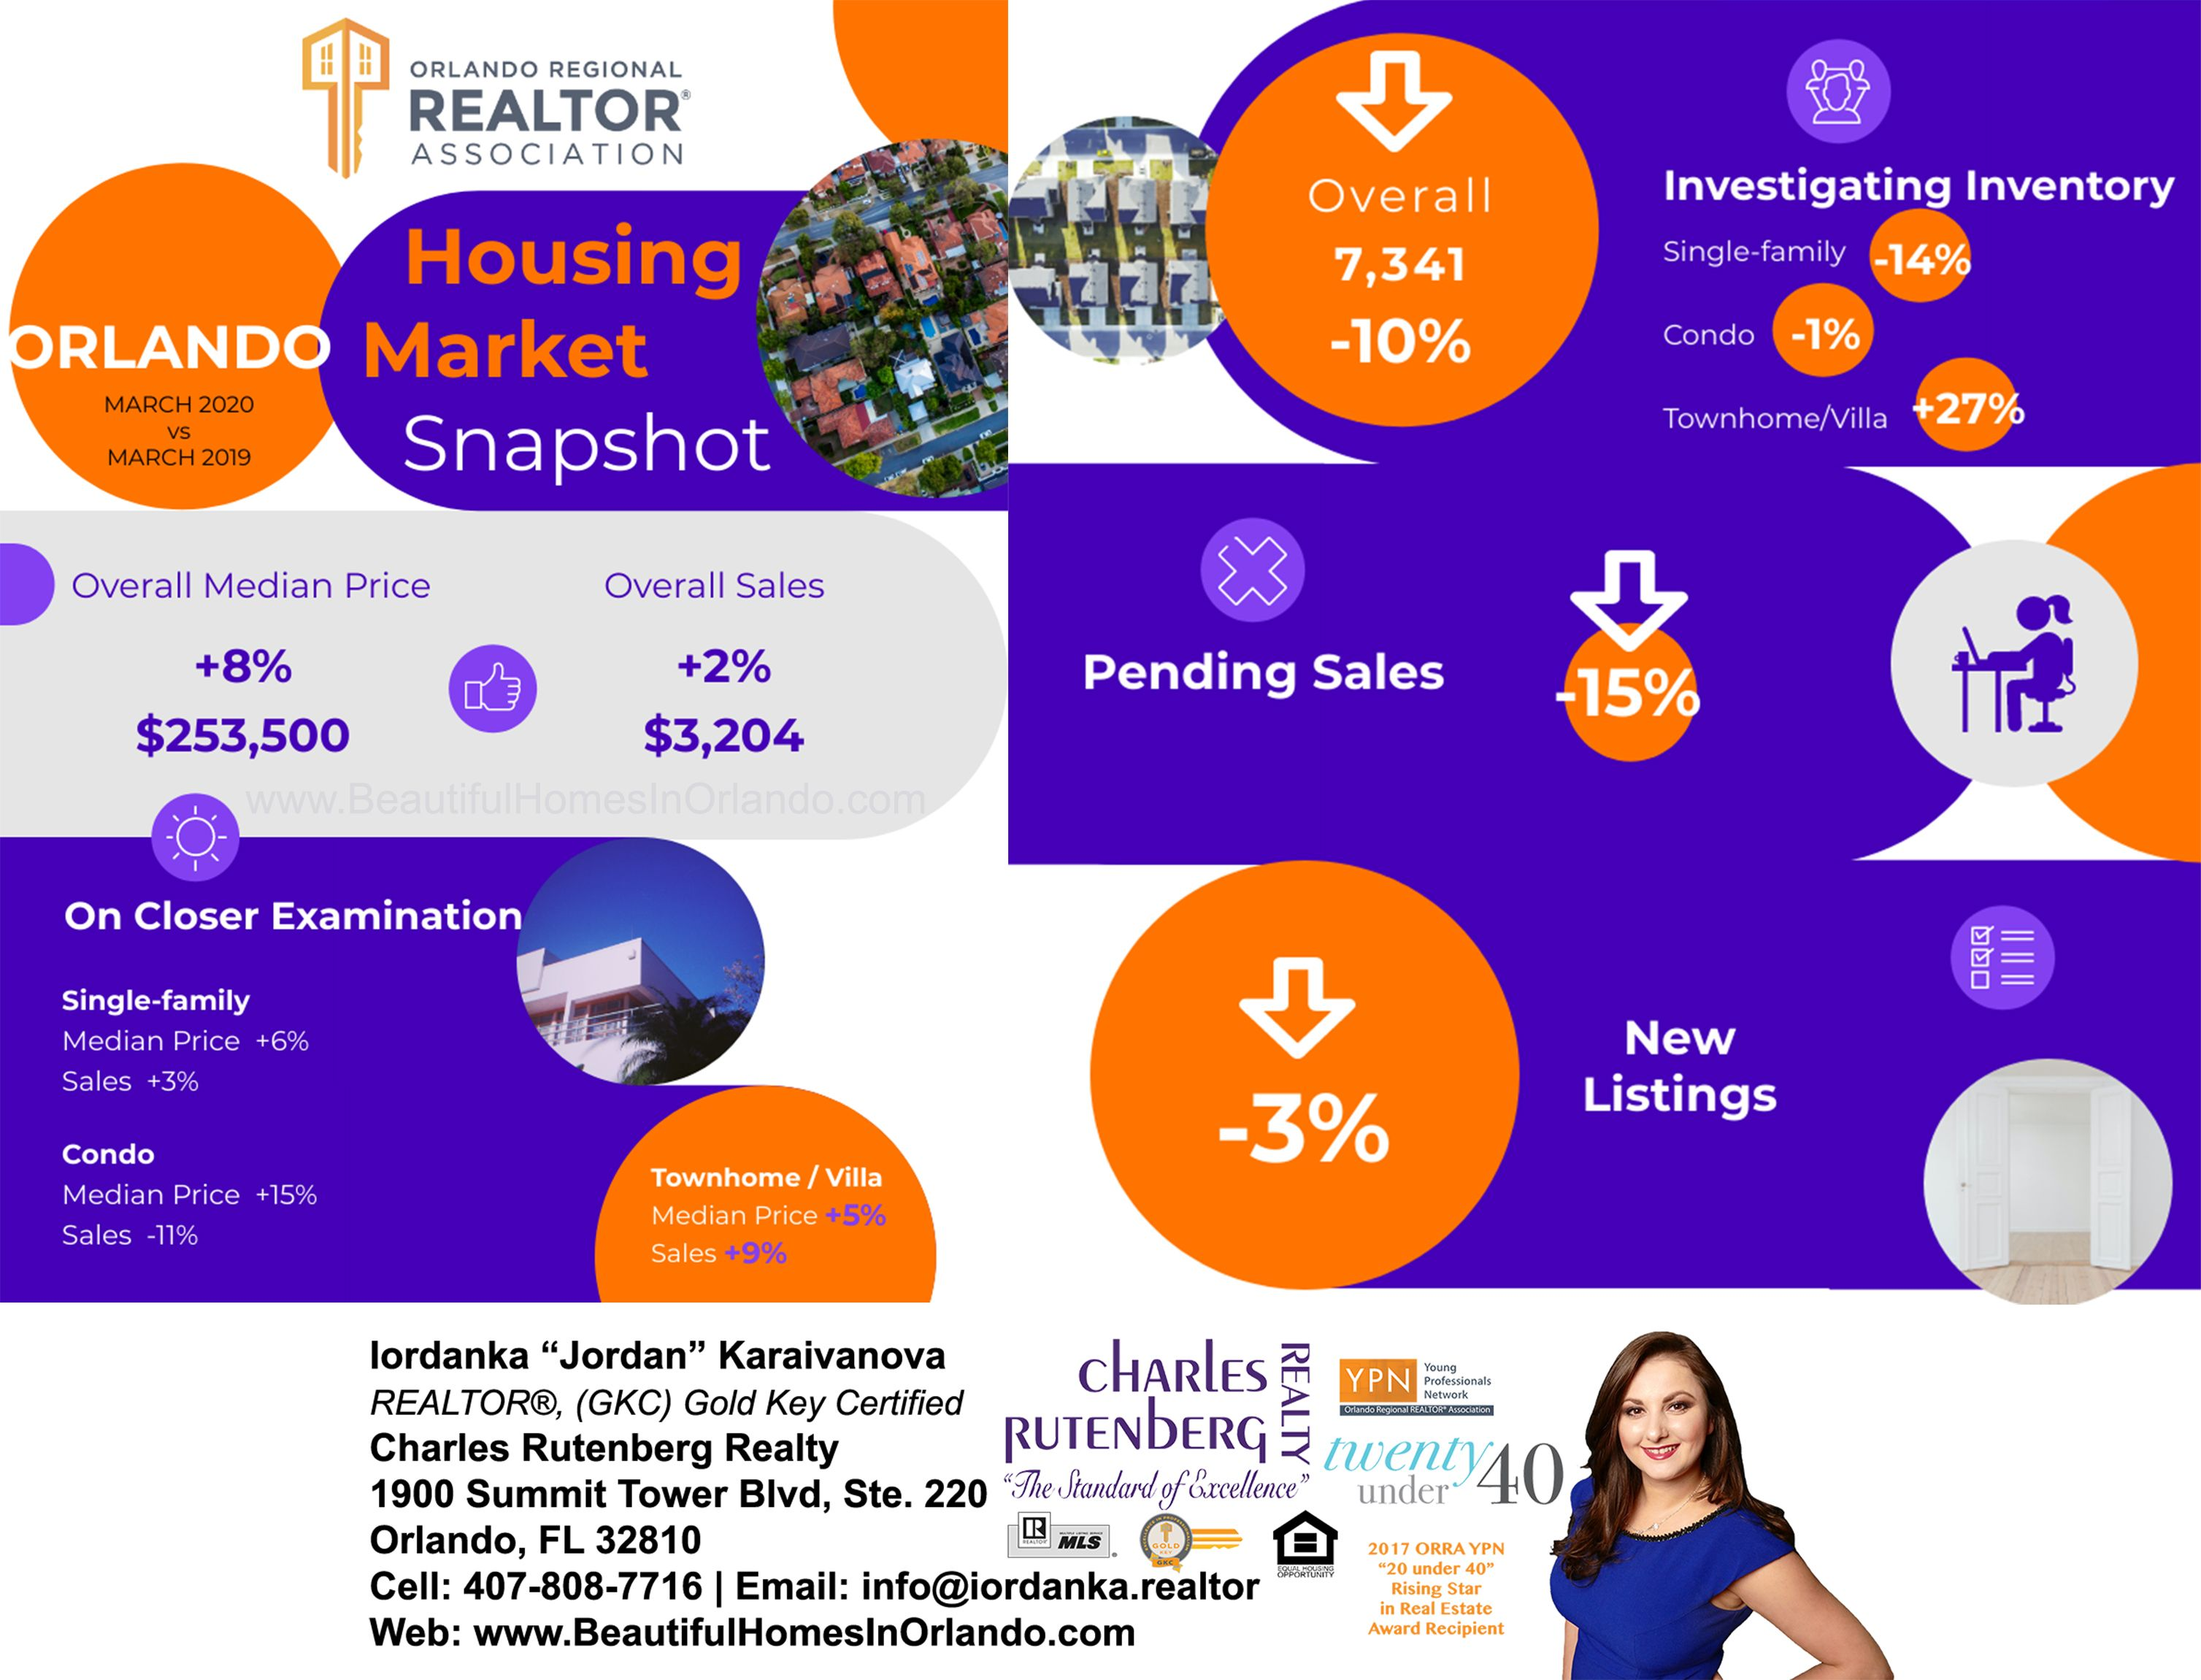 Orlando Housing Market Snapshot Of March 2020 New Tricks Orlando Marketing